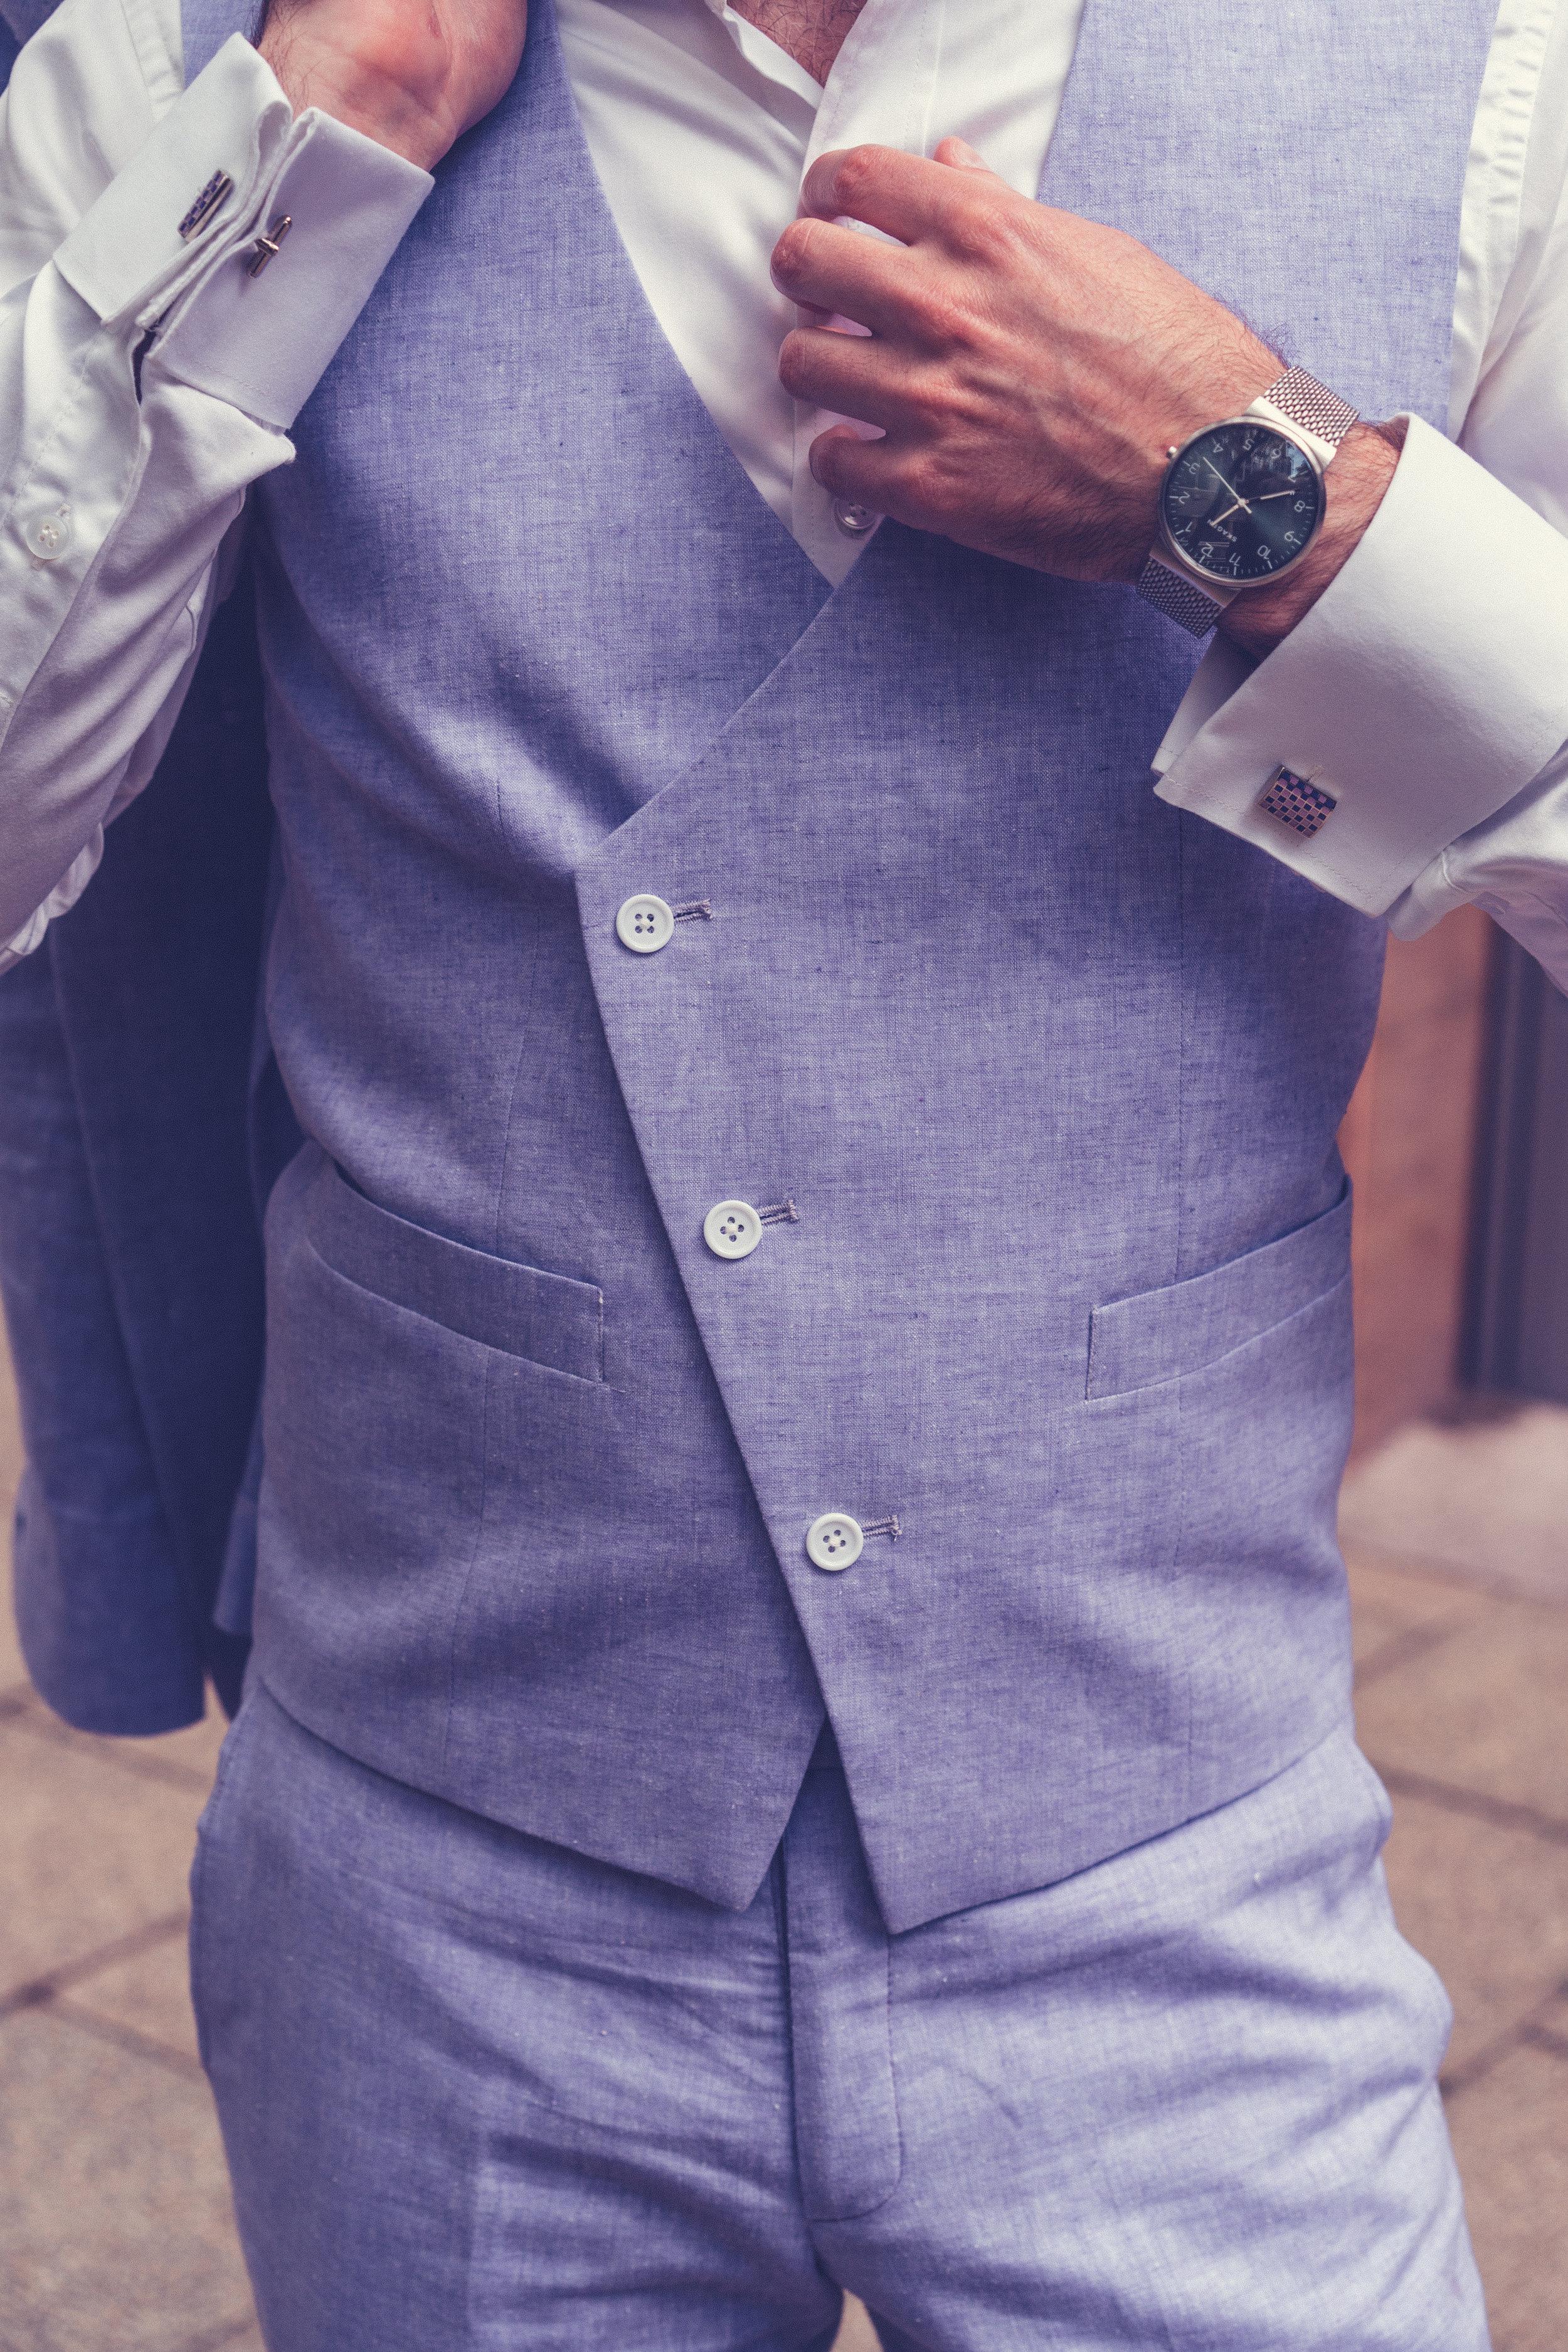 3-Piece suit ($140), dress shirt ($16)